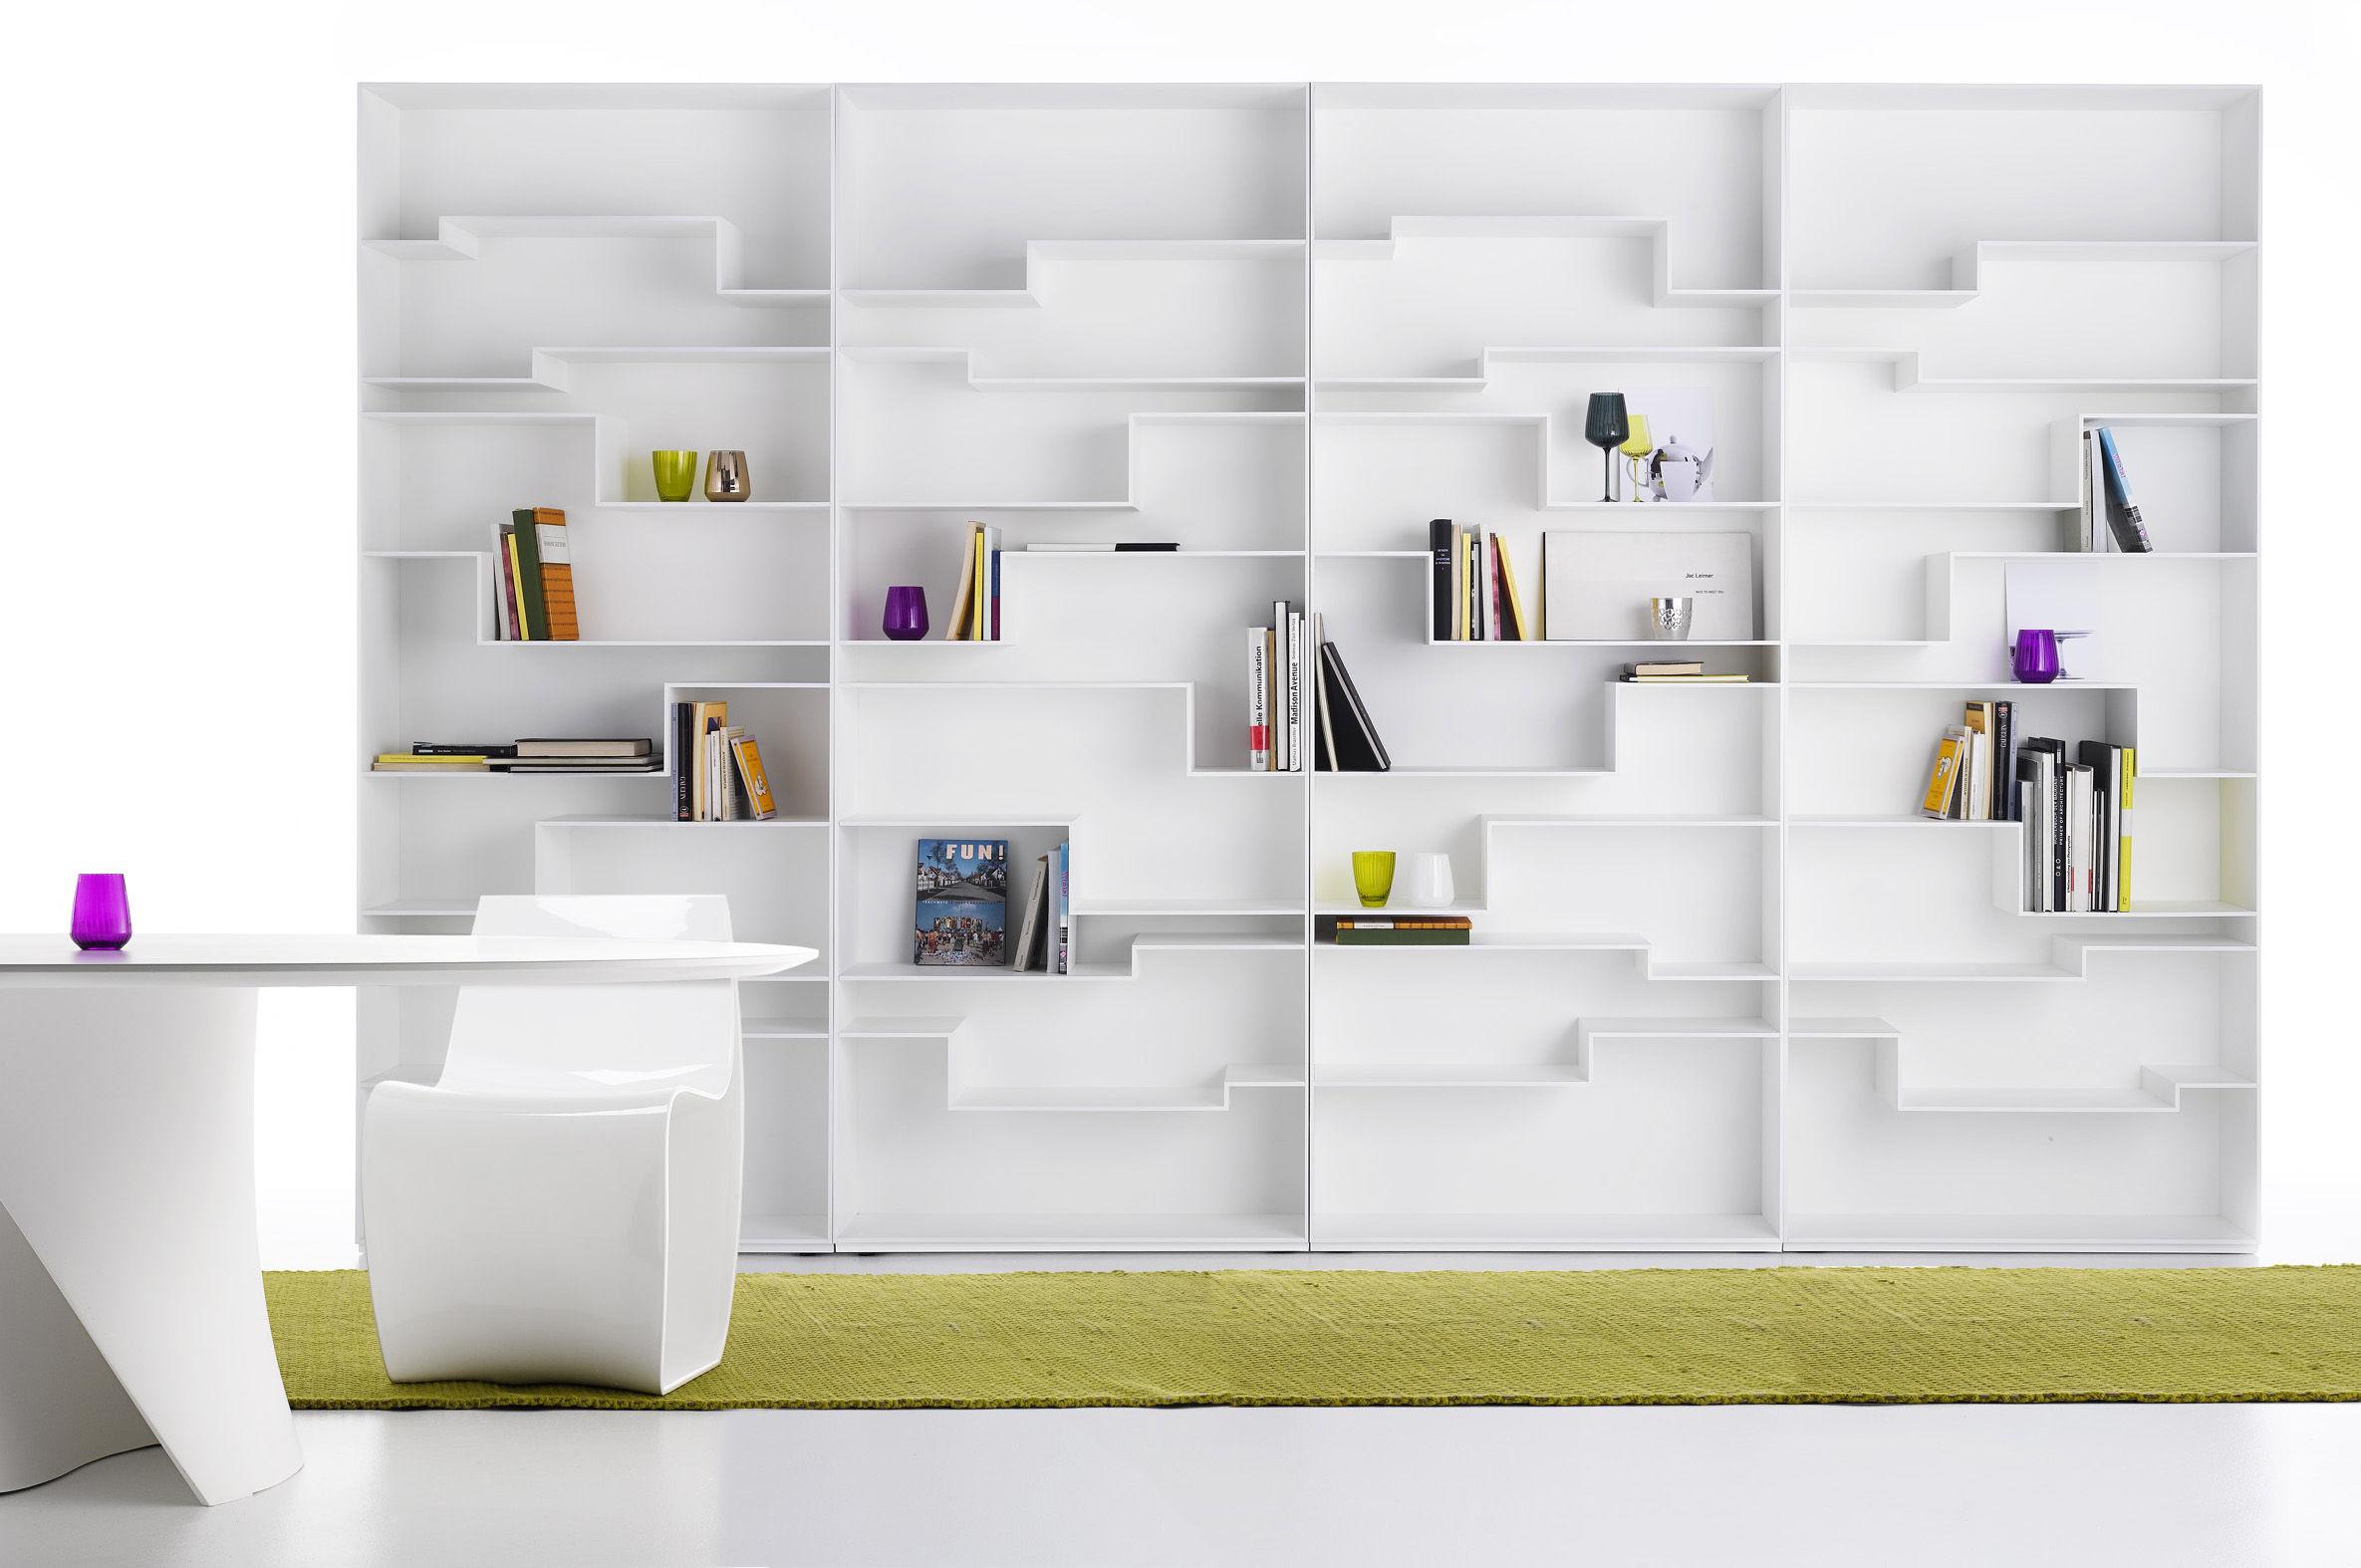 biblioth que melody mdf italia blanc laqu l 88 made. Black Bedroom Furniture Sets. Home Design Ideas